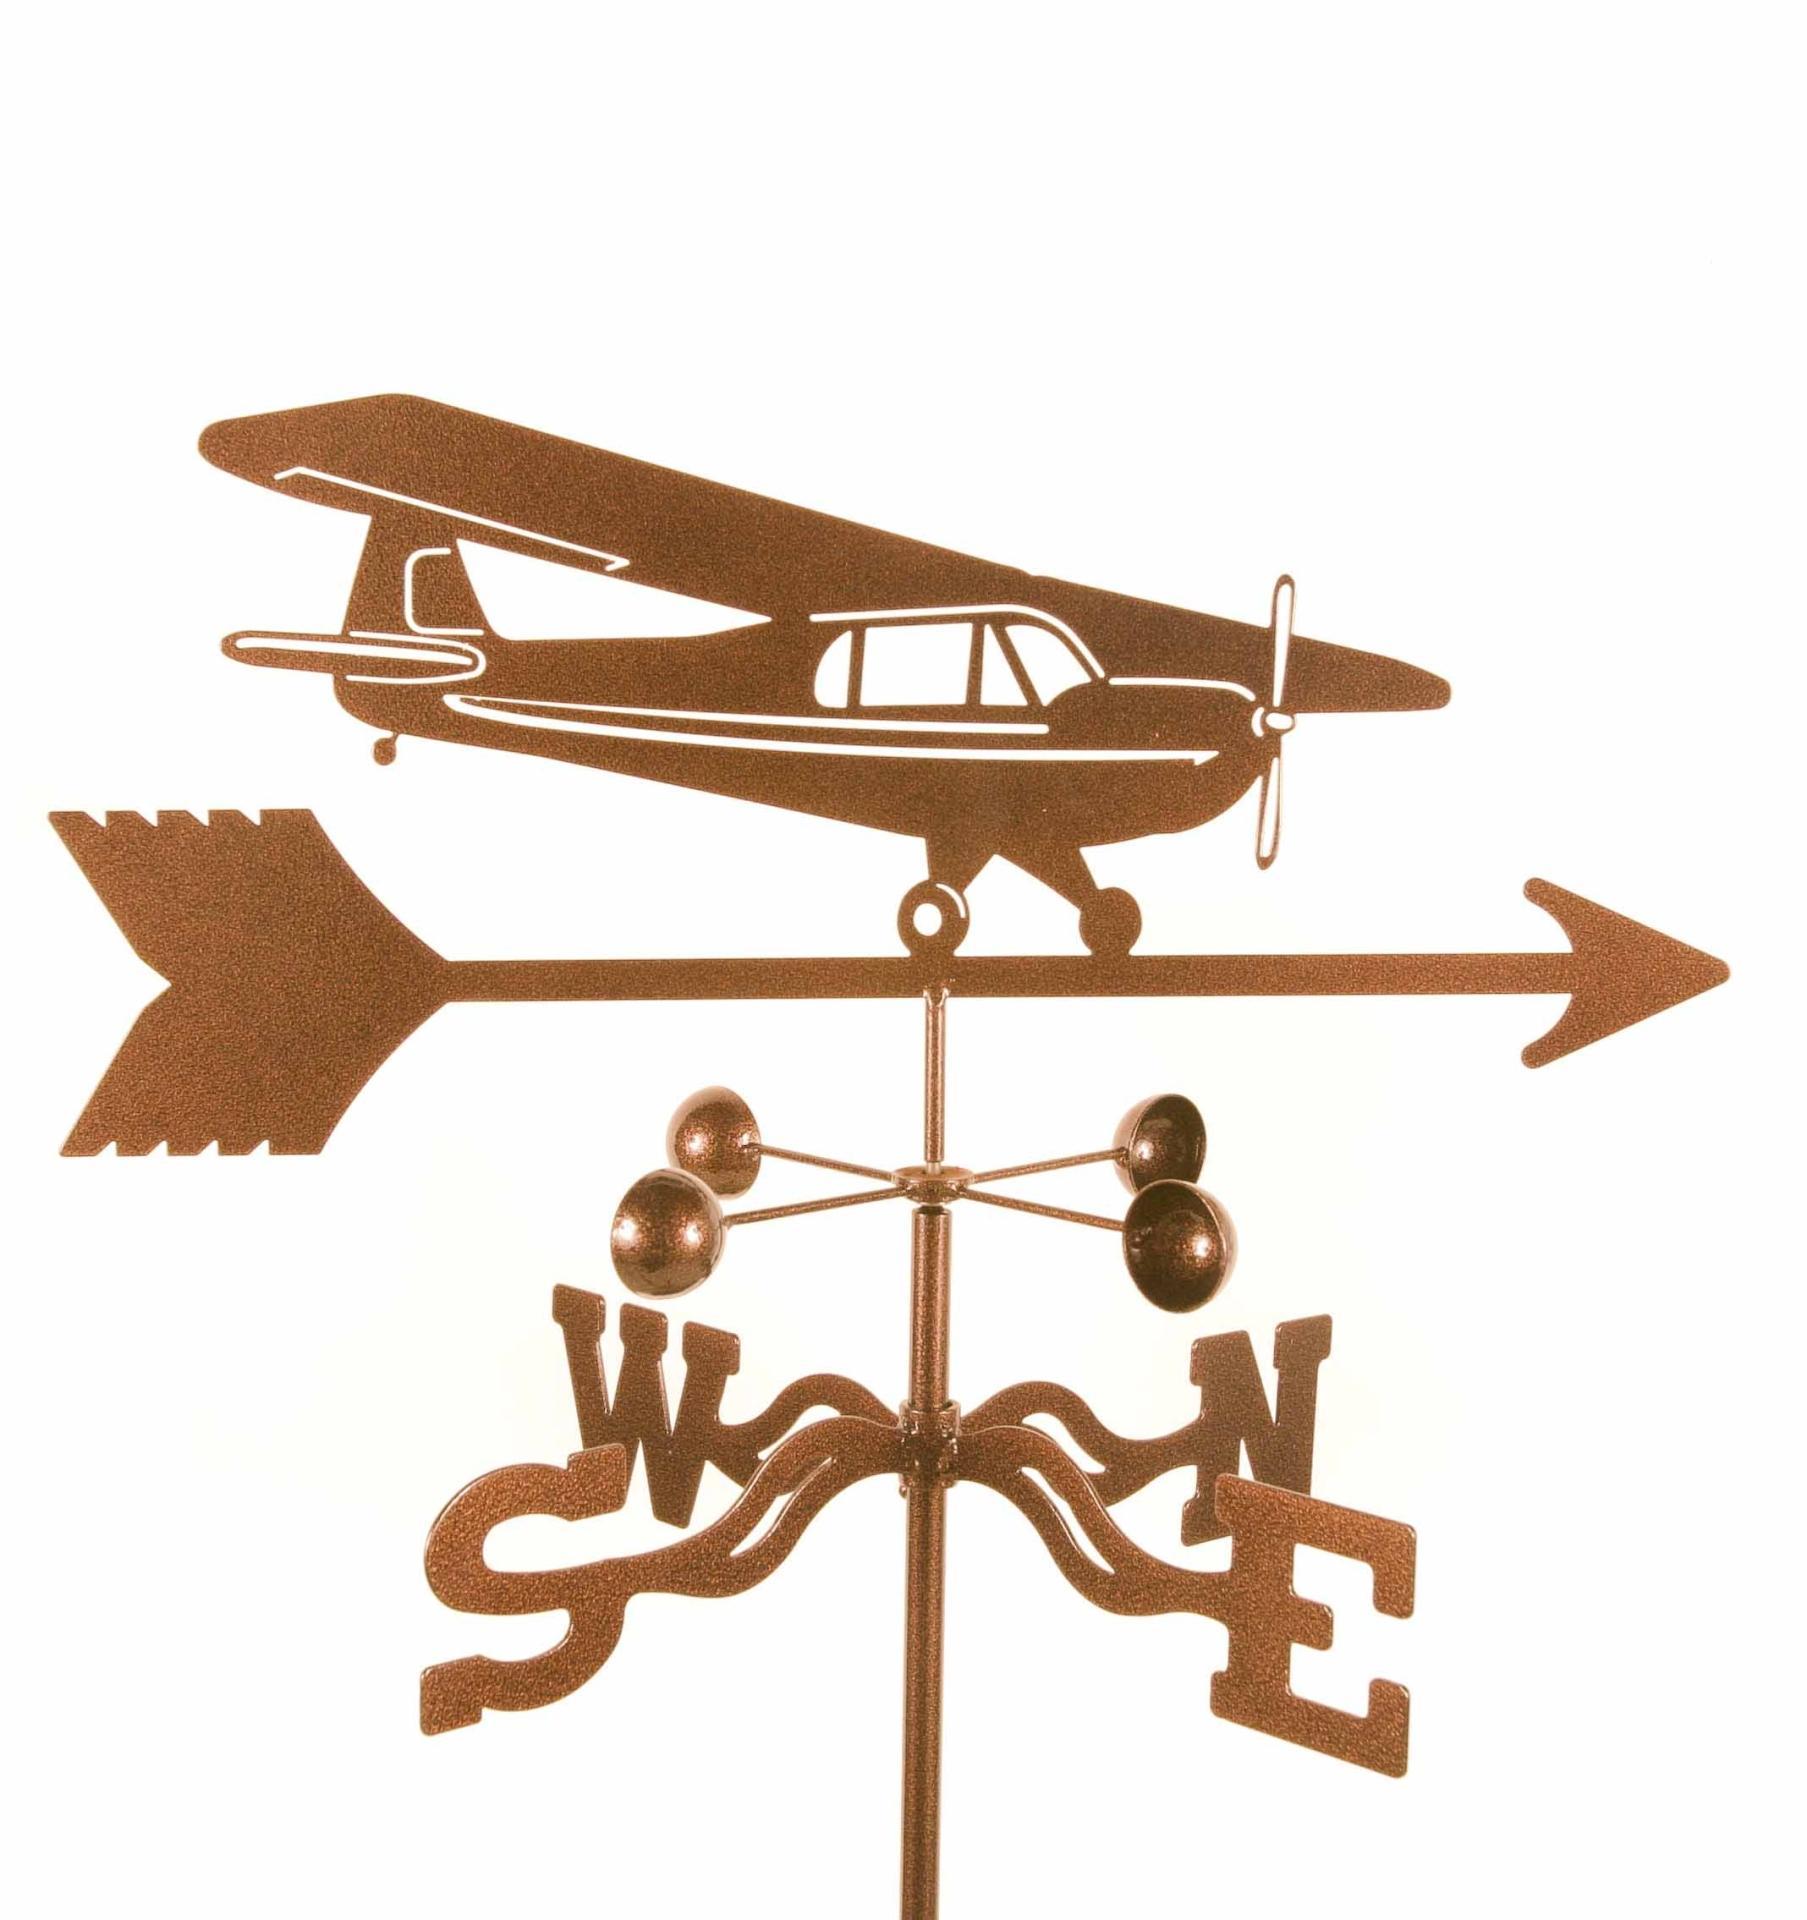 High Wing Airplane Weathervane-0